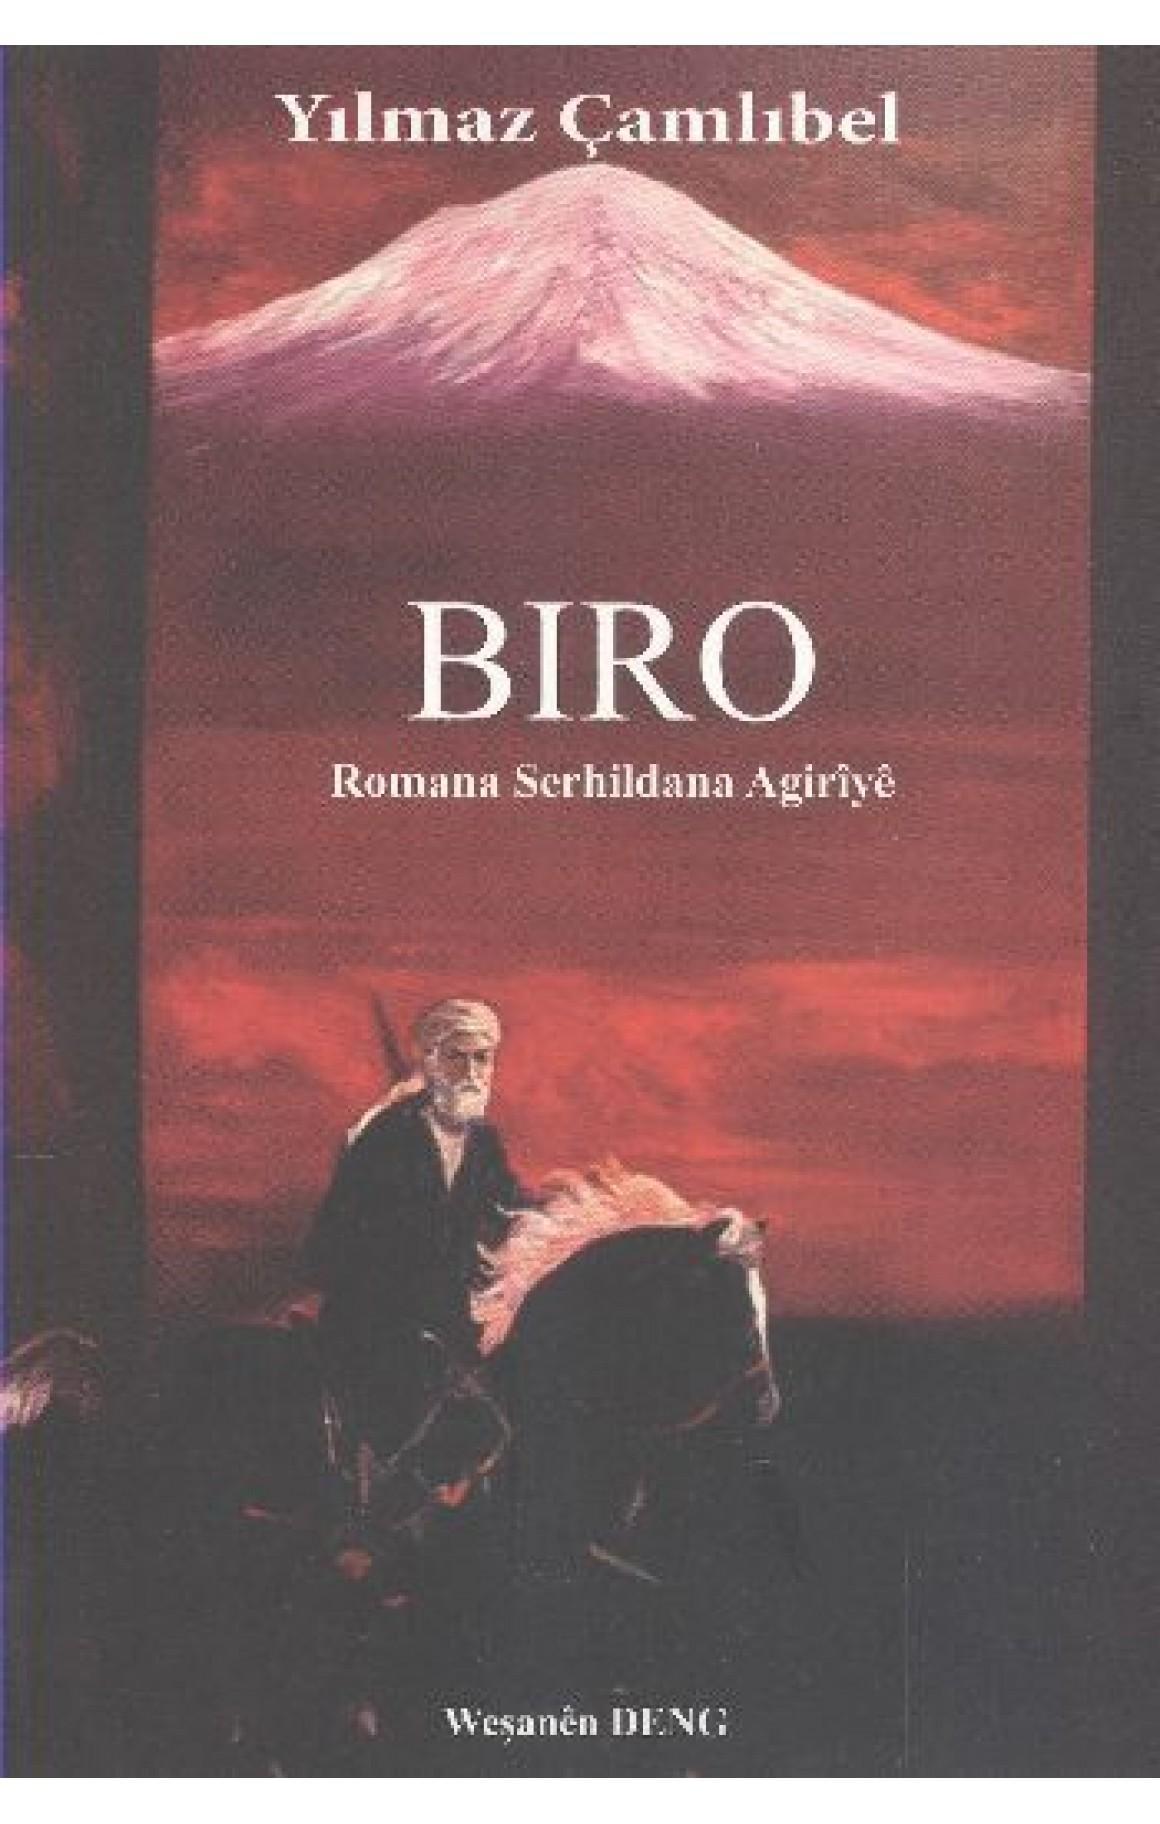 Biro - Romana Serhildana Agiriyê